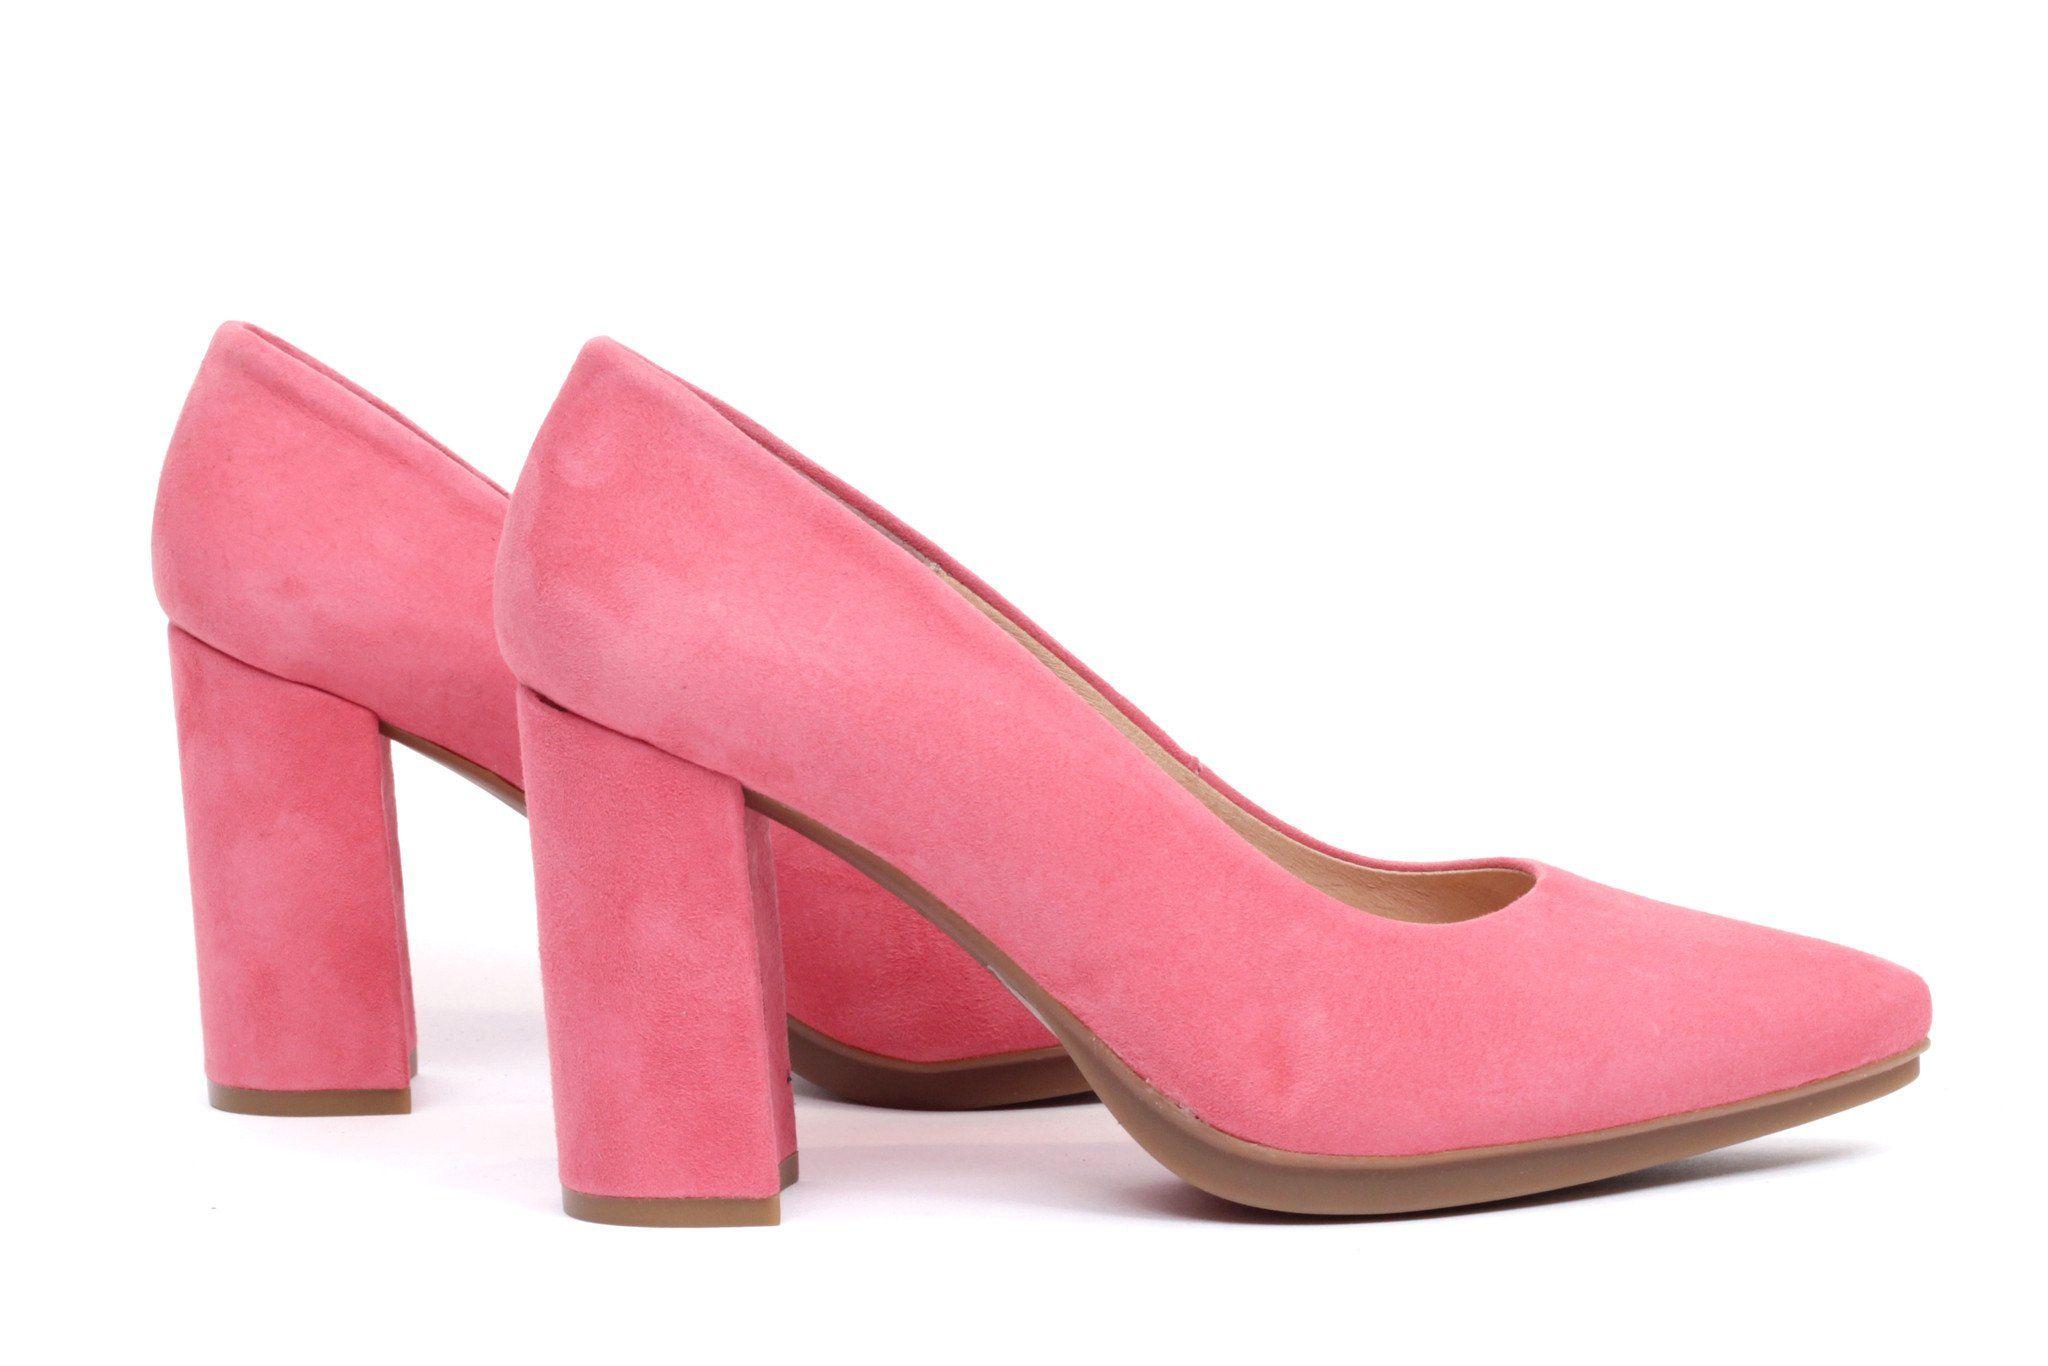 5593d05d3 miMaO Urban Rosa Geranio- Zapato mujer de tacon salon vestir maquillaje  cómodo - women high heels shoes rose pink makeup color comfort pumps